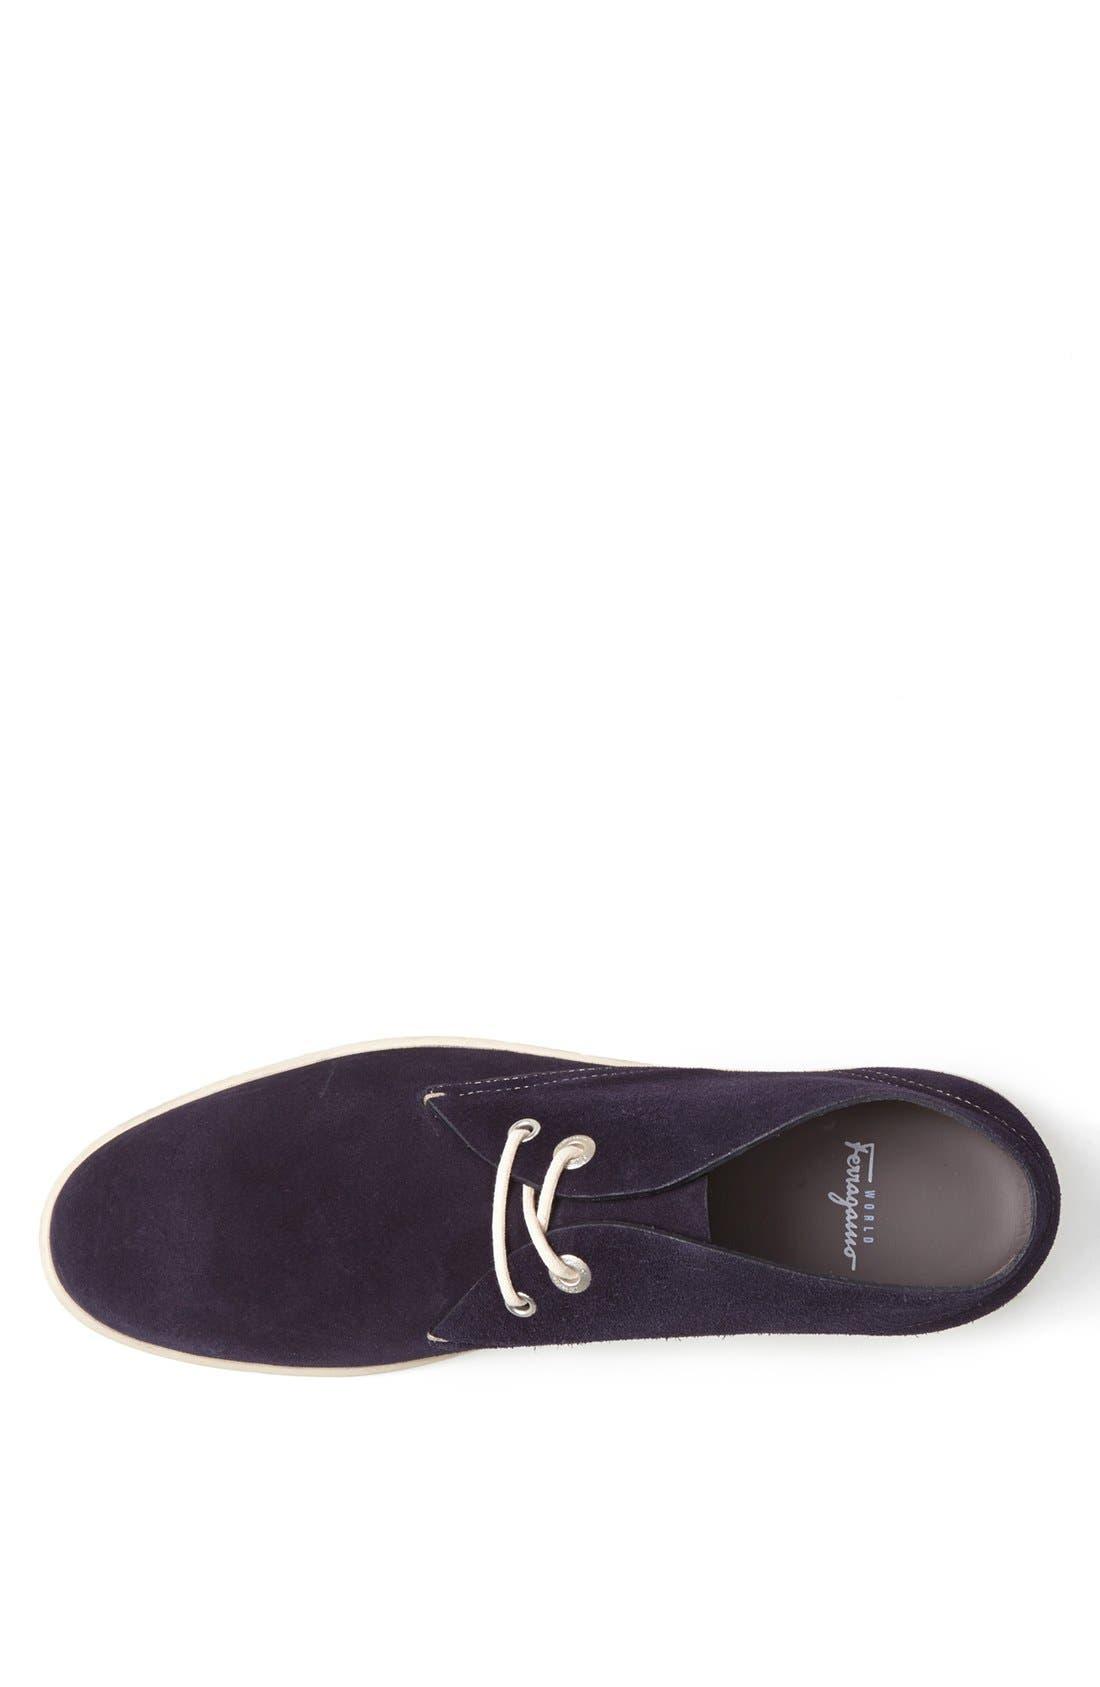 Alternate Image 3  - Salvatore Ferragamo 'Rico' Chukka Sneaker